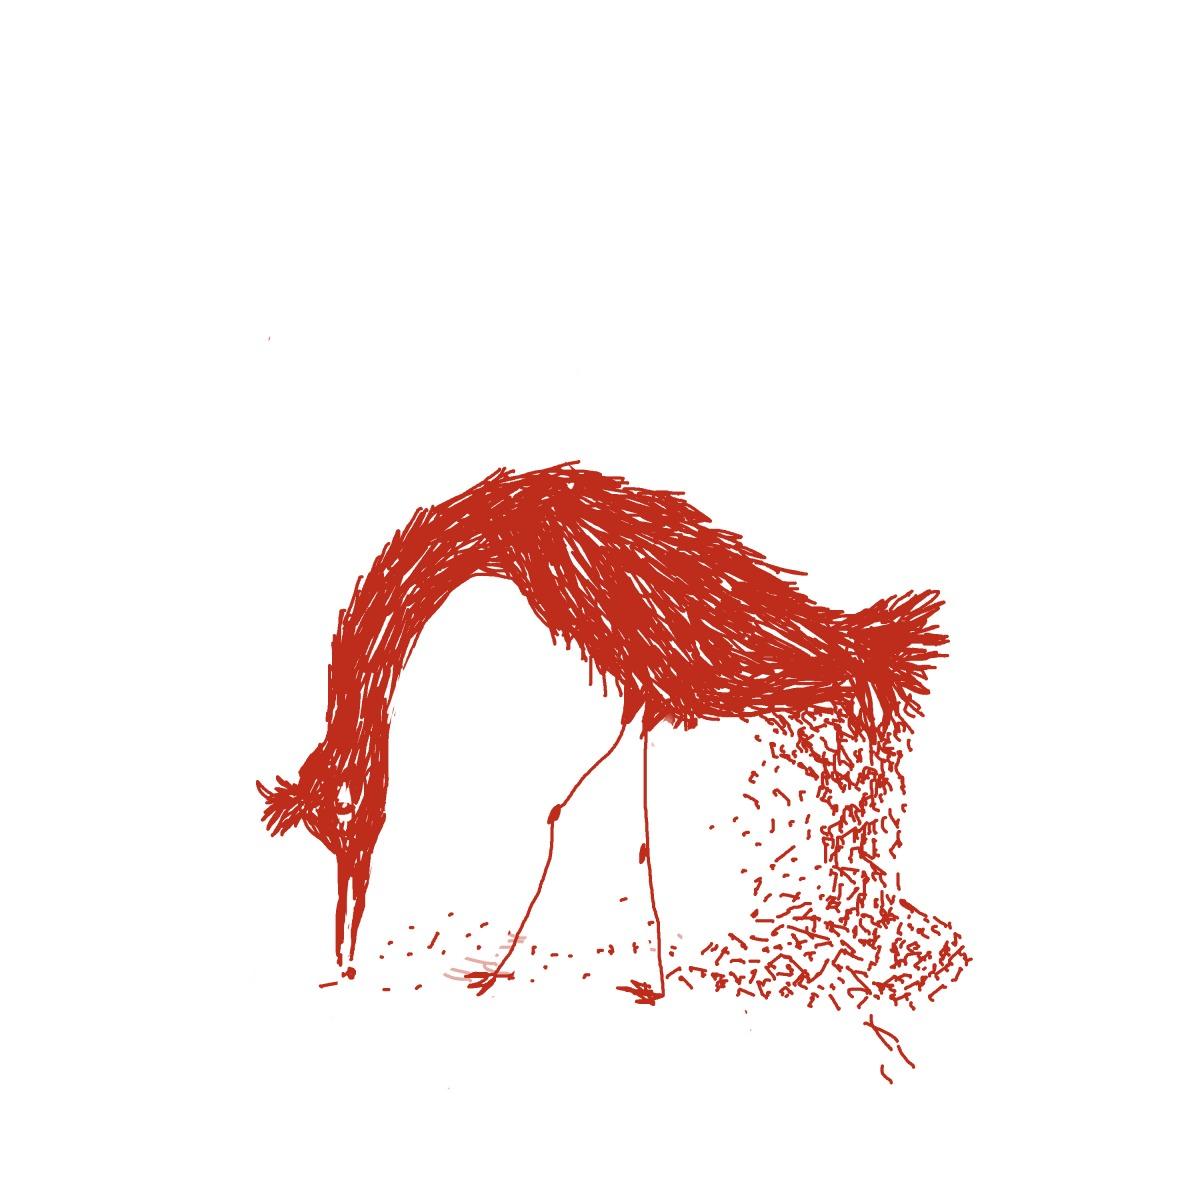 Avner Ben Gal: Take the Long Bone Home Givon Gallery March 23 – April 28, 2018